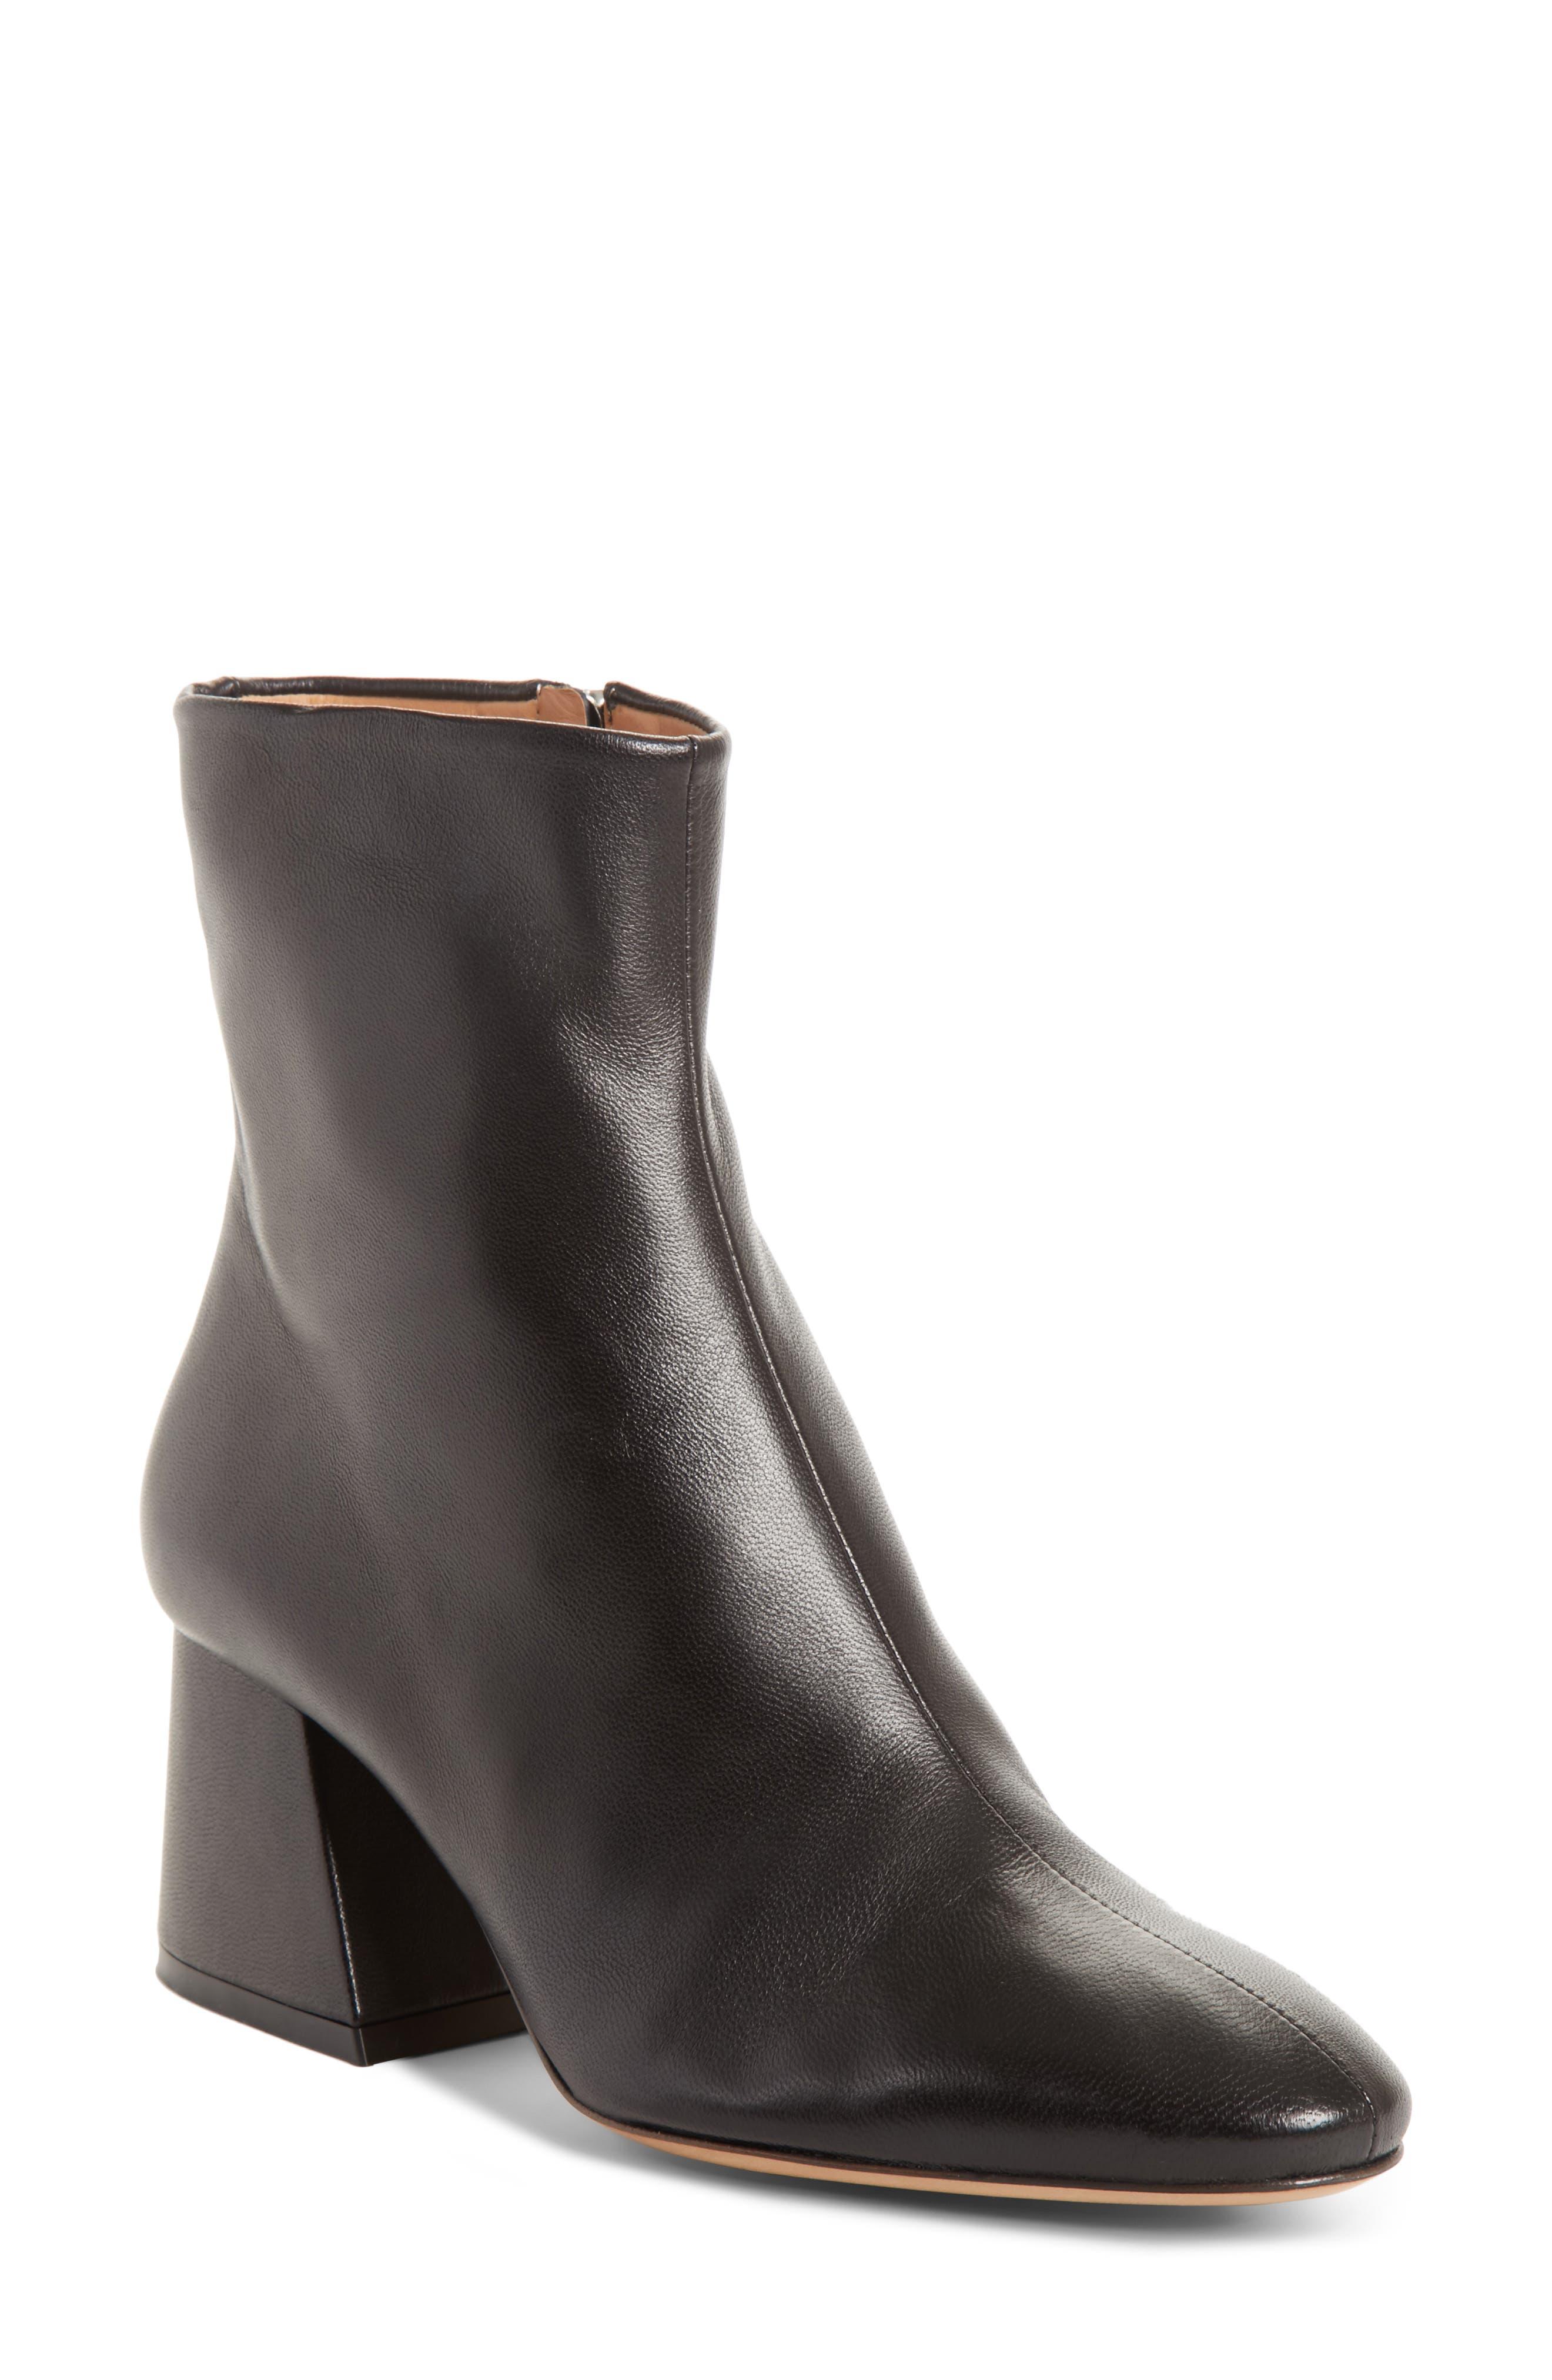 Main Image - Maison Margiela Flare Heel Ankle Boot (Women)